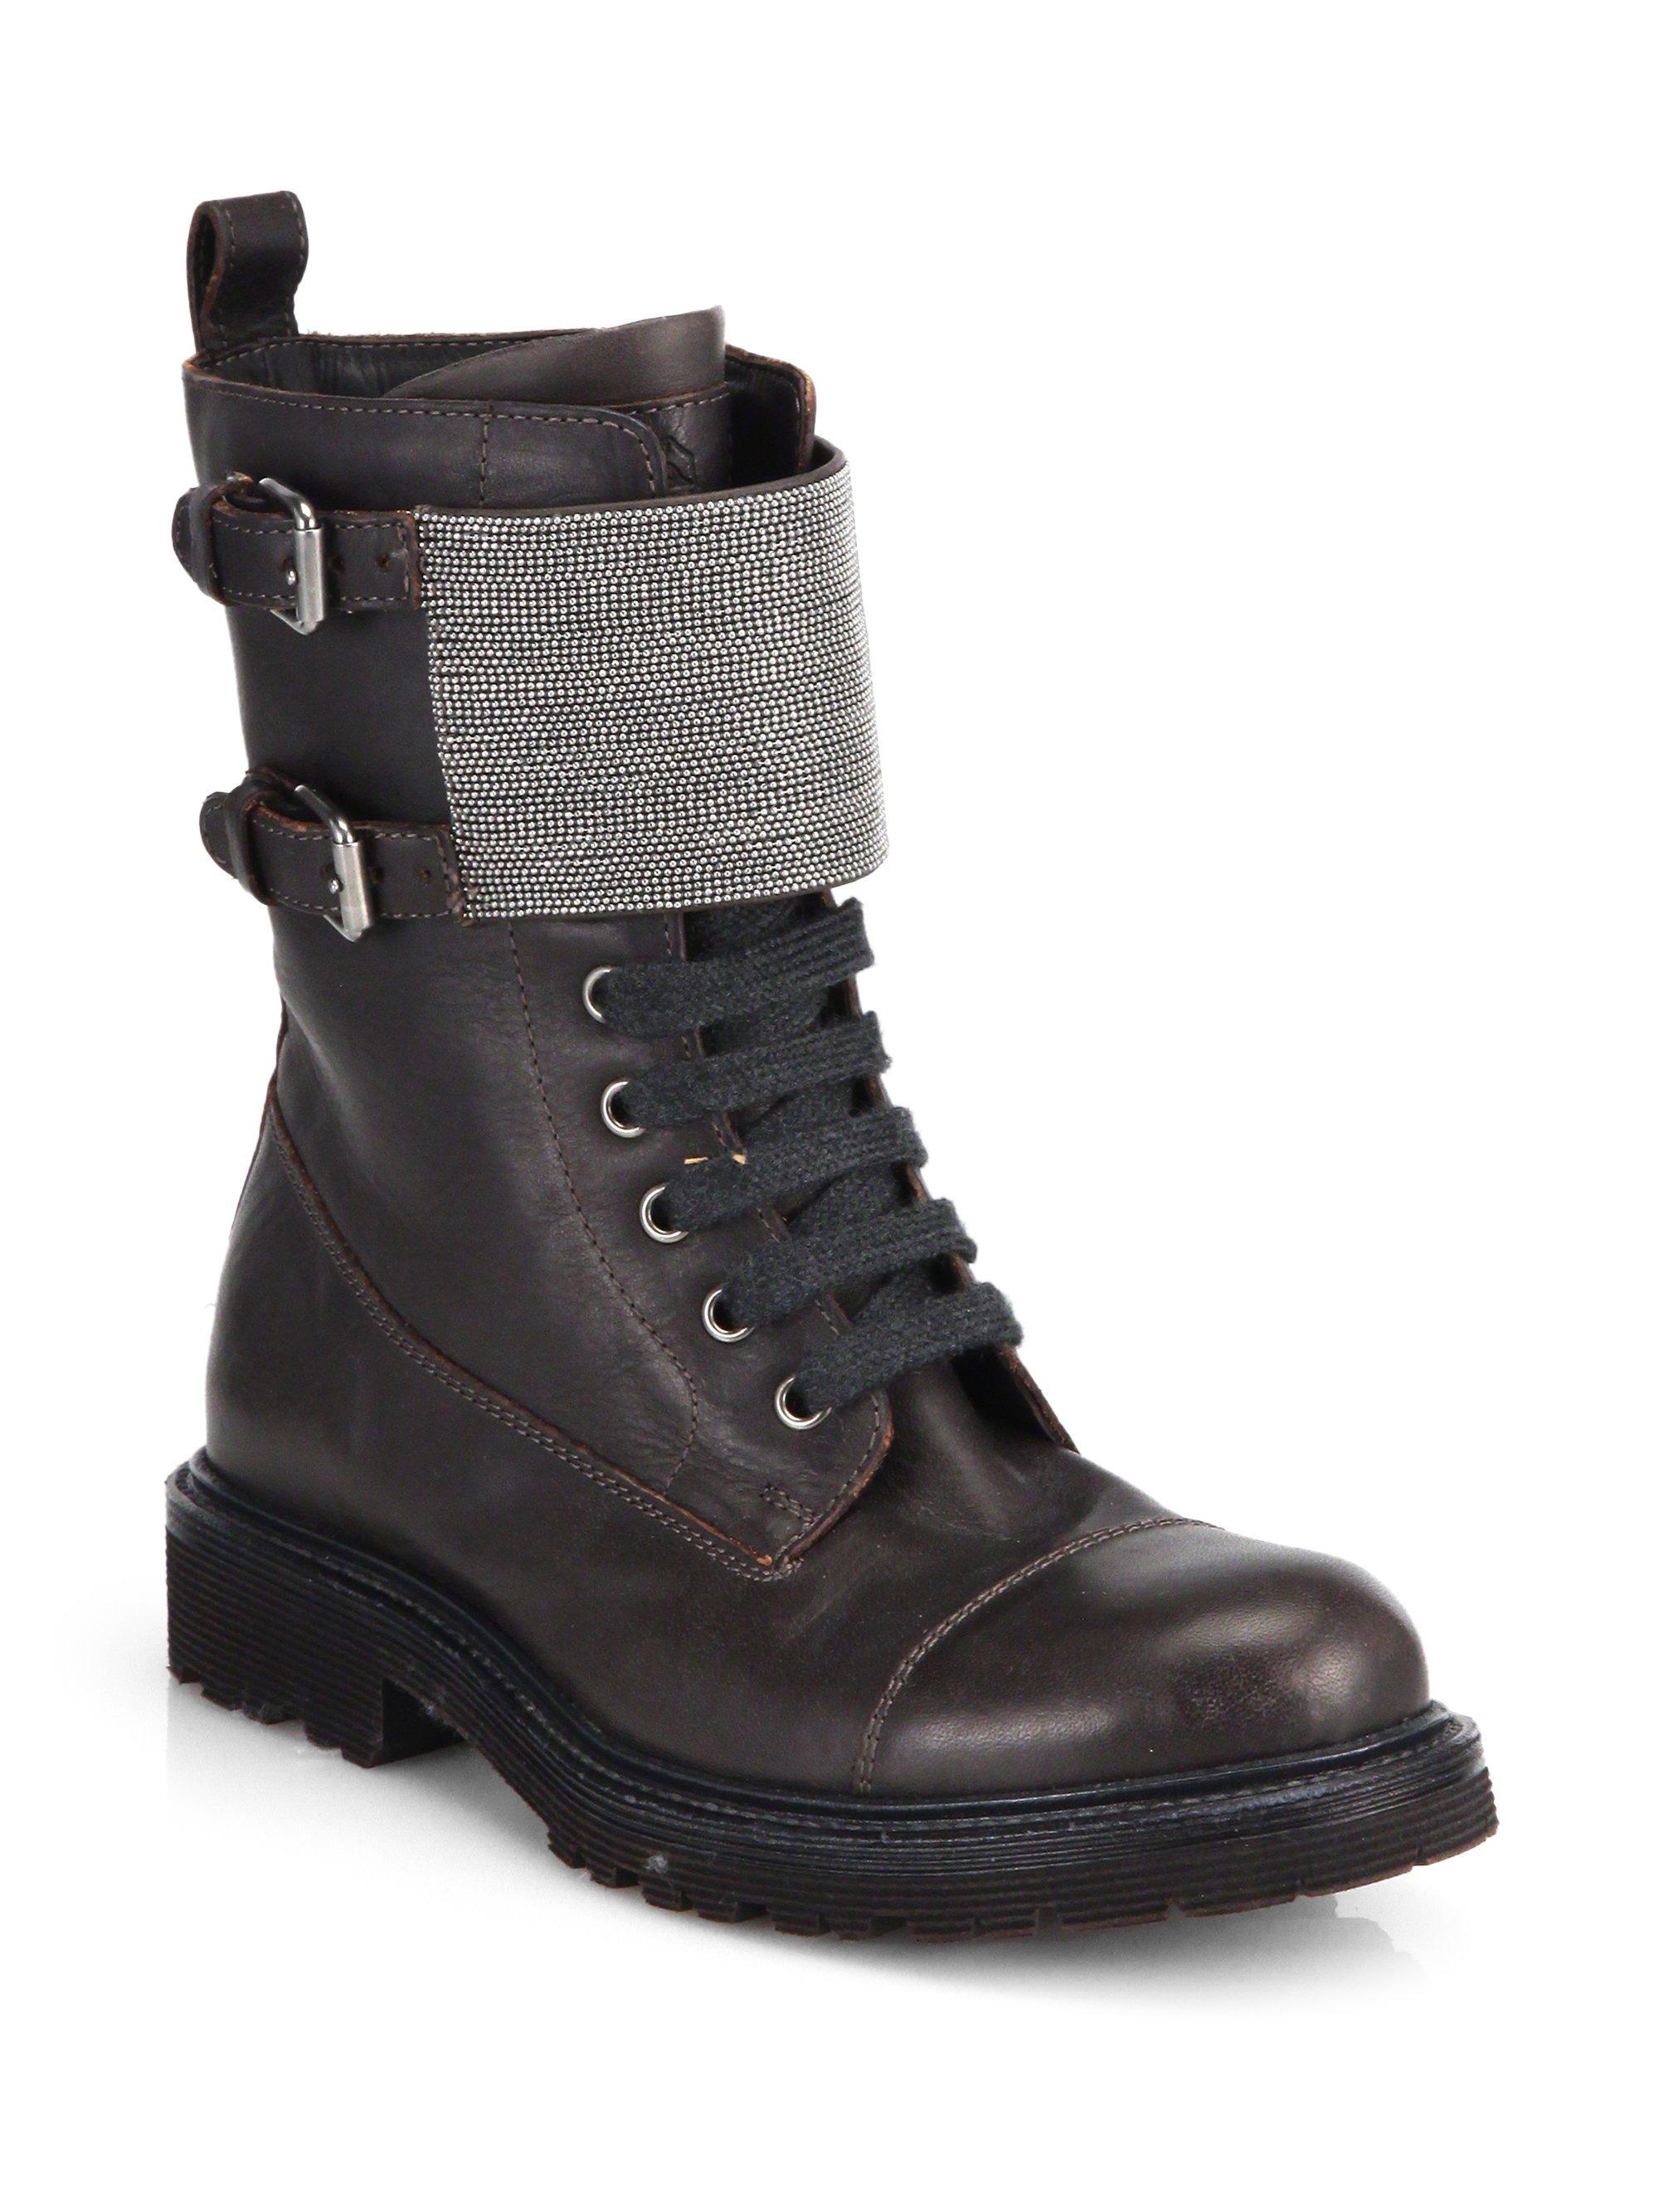 Brunello Cucinelli Monili Beaded Leather Combat Boots In